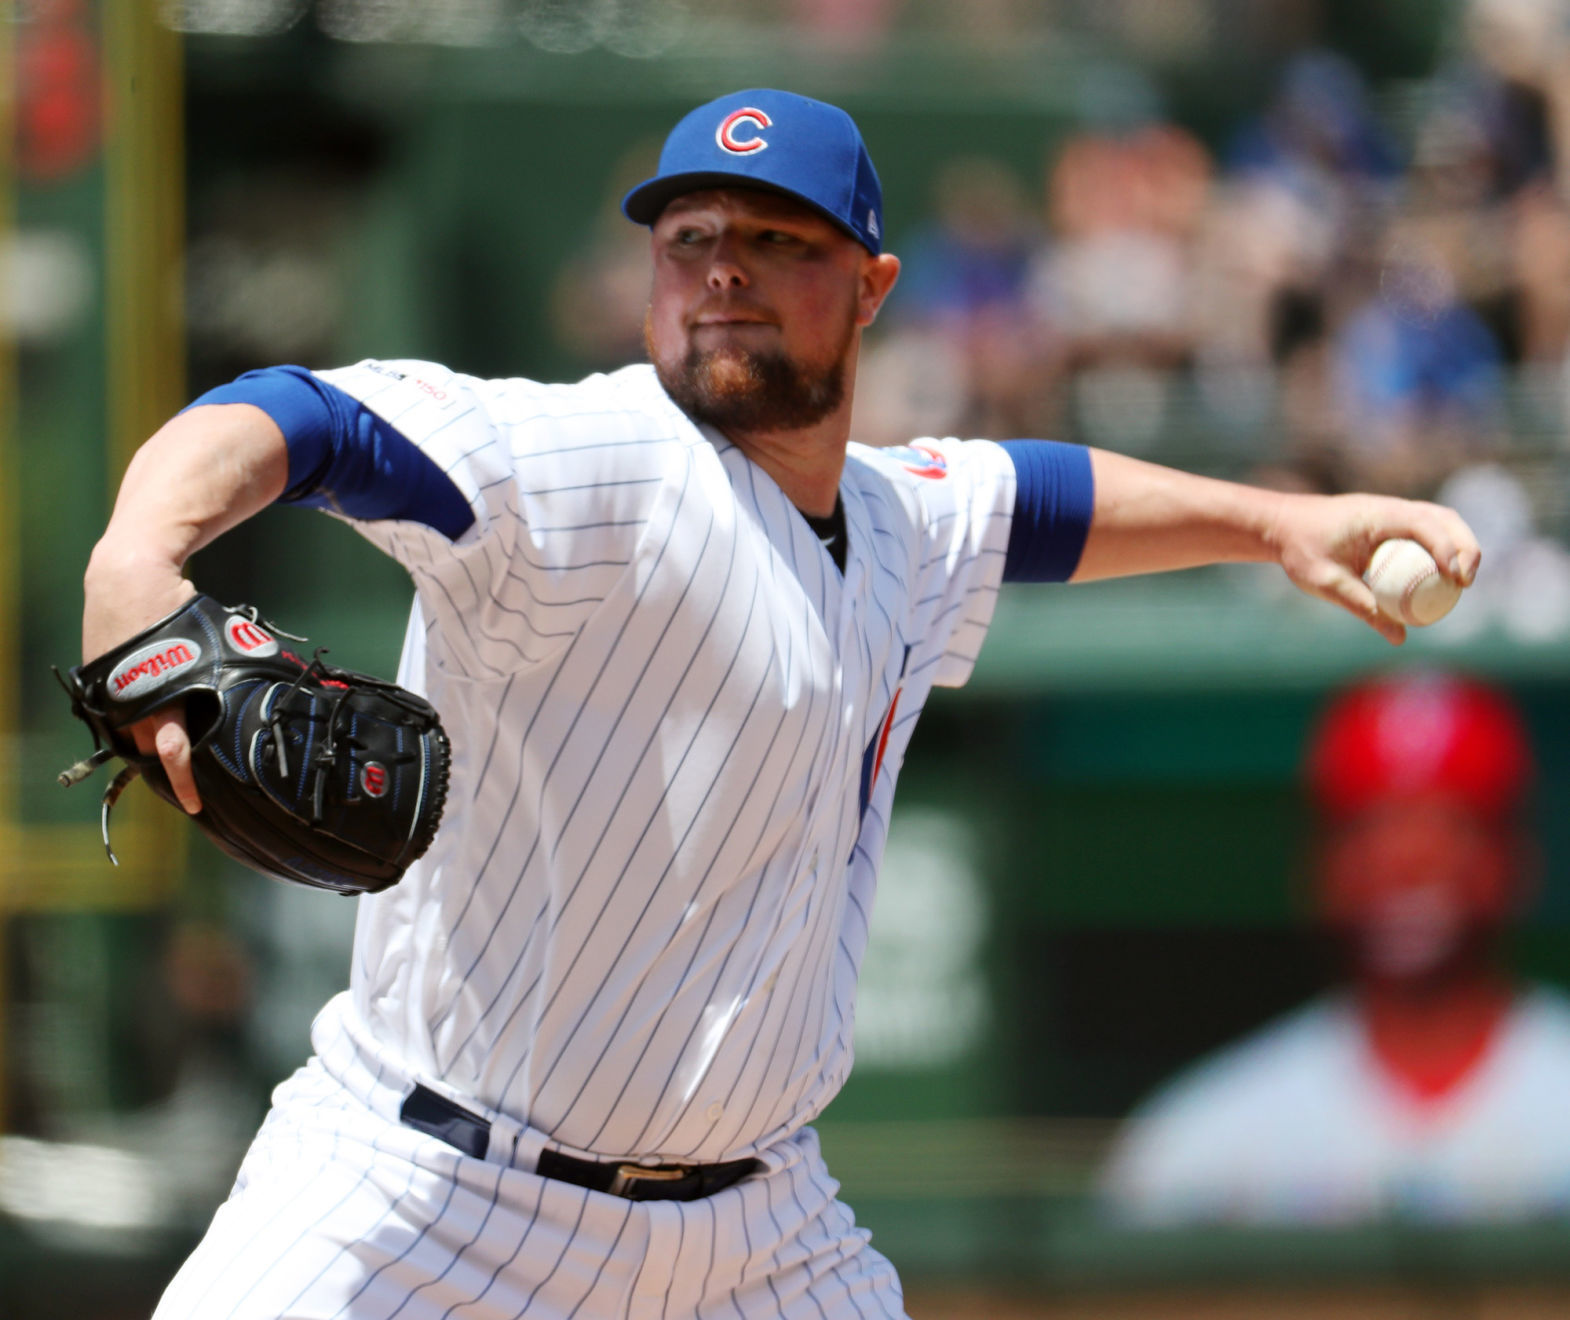 Lester unfazed by 'panic' among Cubs fan